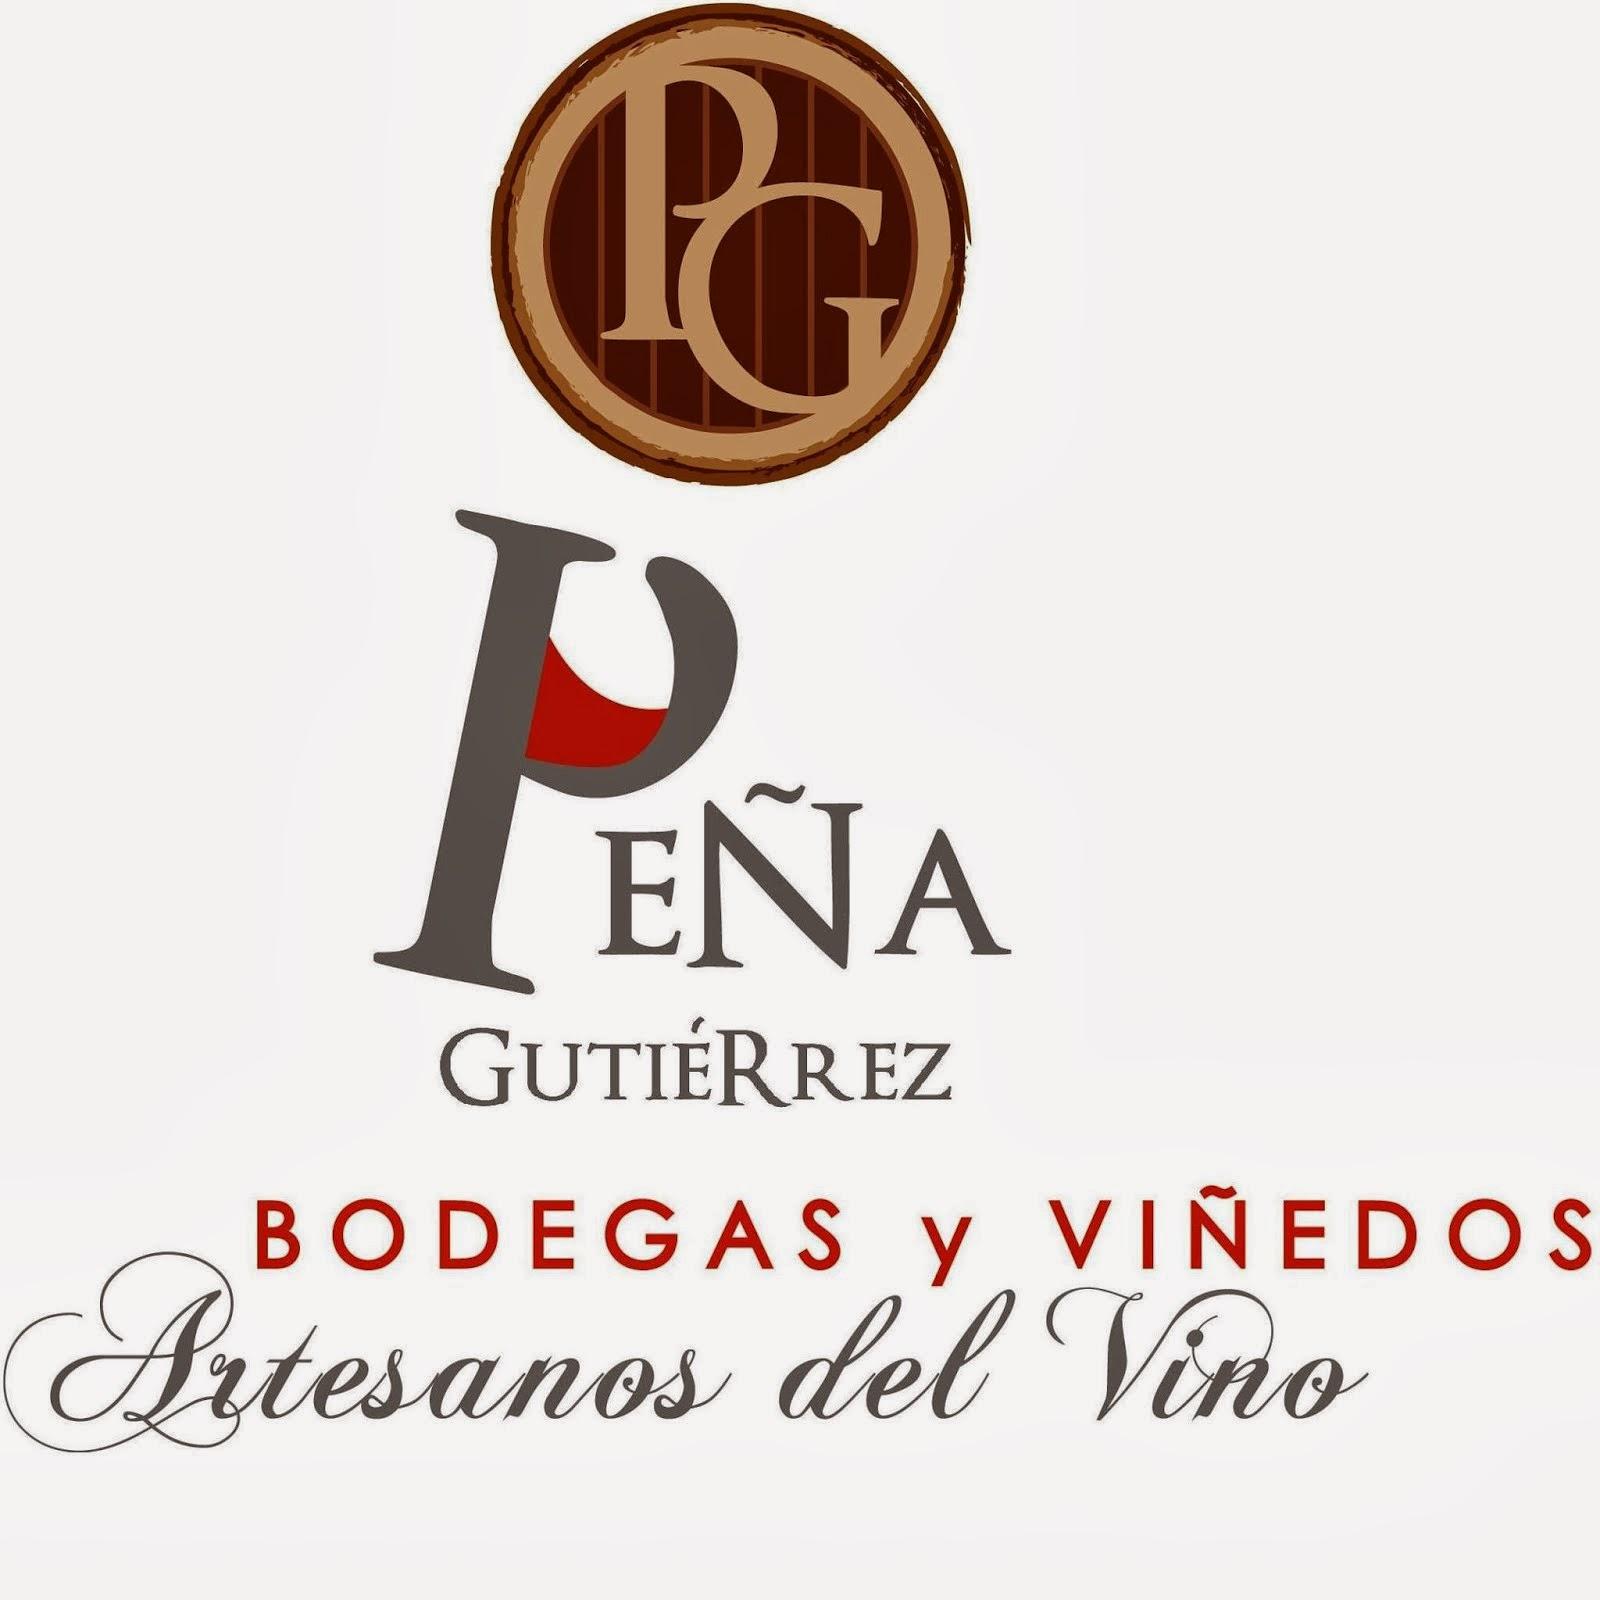 Bodegas Peña Gutierrez